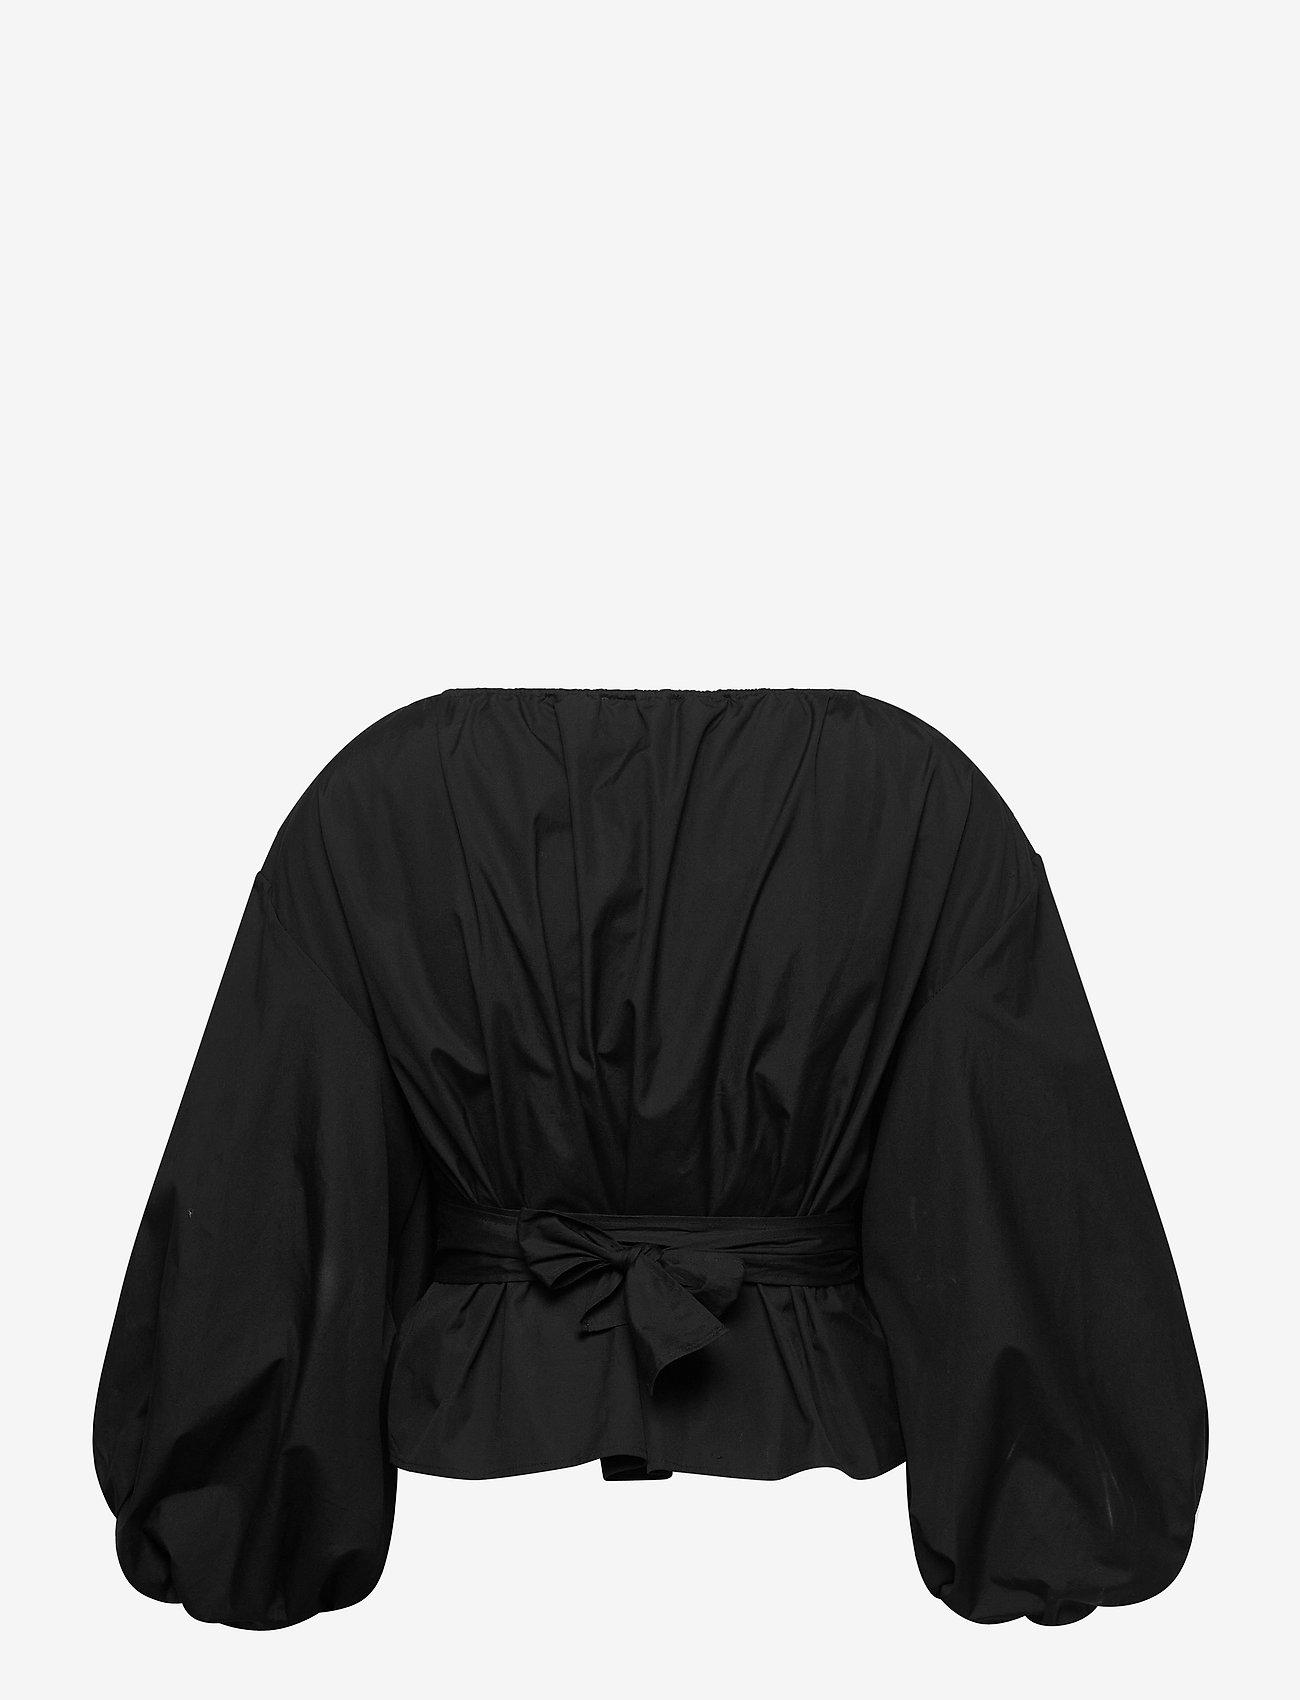 Michael Kors - COTTON POPLIN WRAP TP - blouses met lange mouwen - black - 1